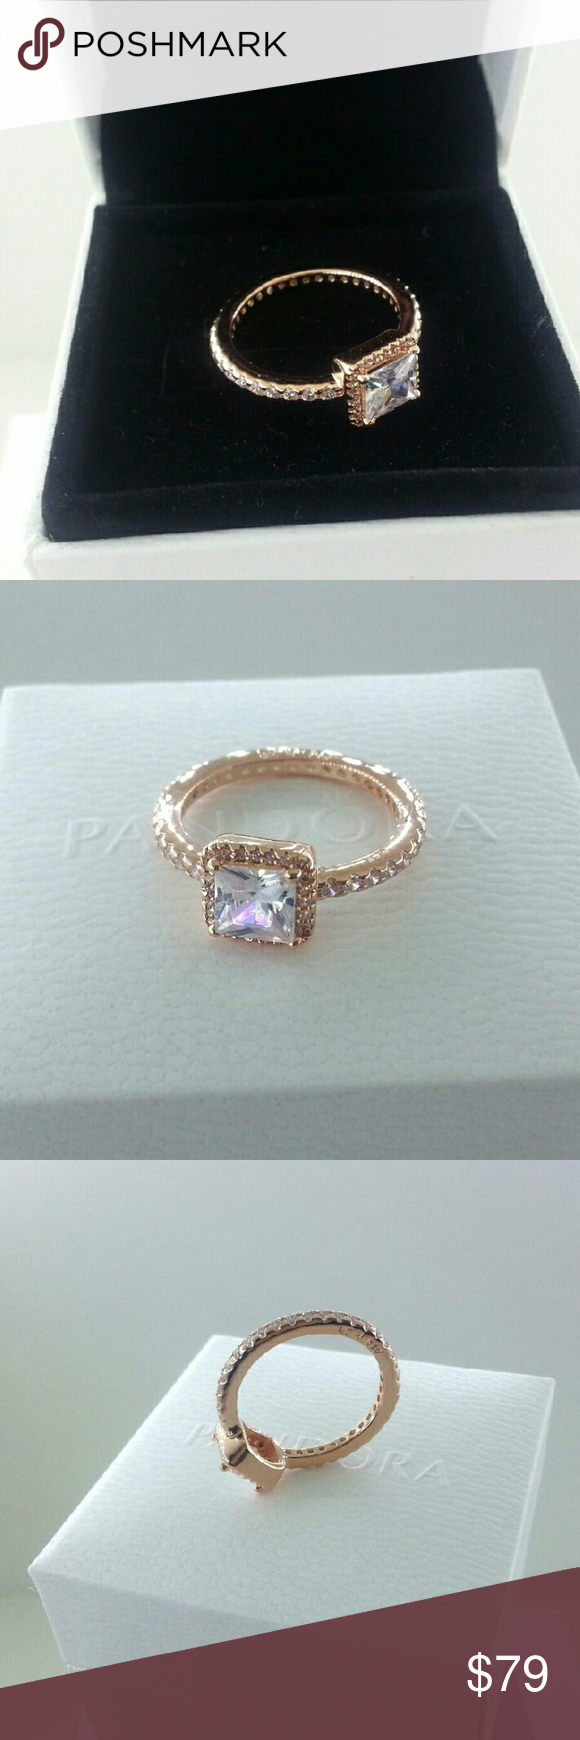 38eedaaf9 ... Pandora Rose Gold Timeless Elegance Ring 6 Pandora Rose Gold Timeless  Elegance Ring 180947CZ Size 52 ...